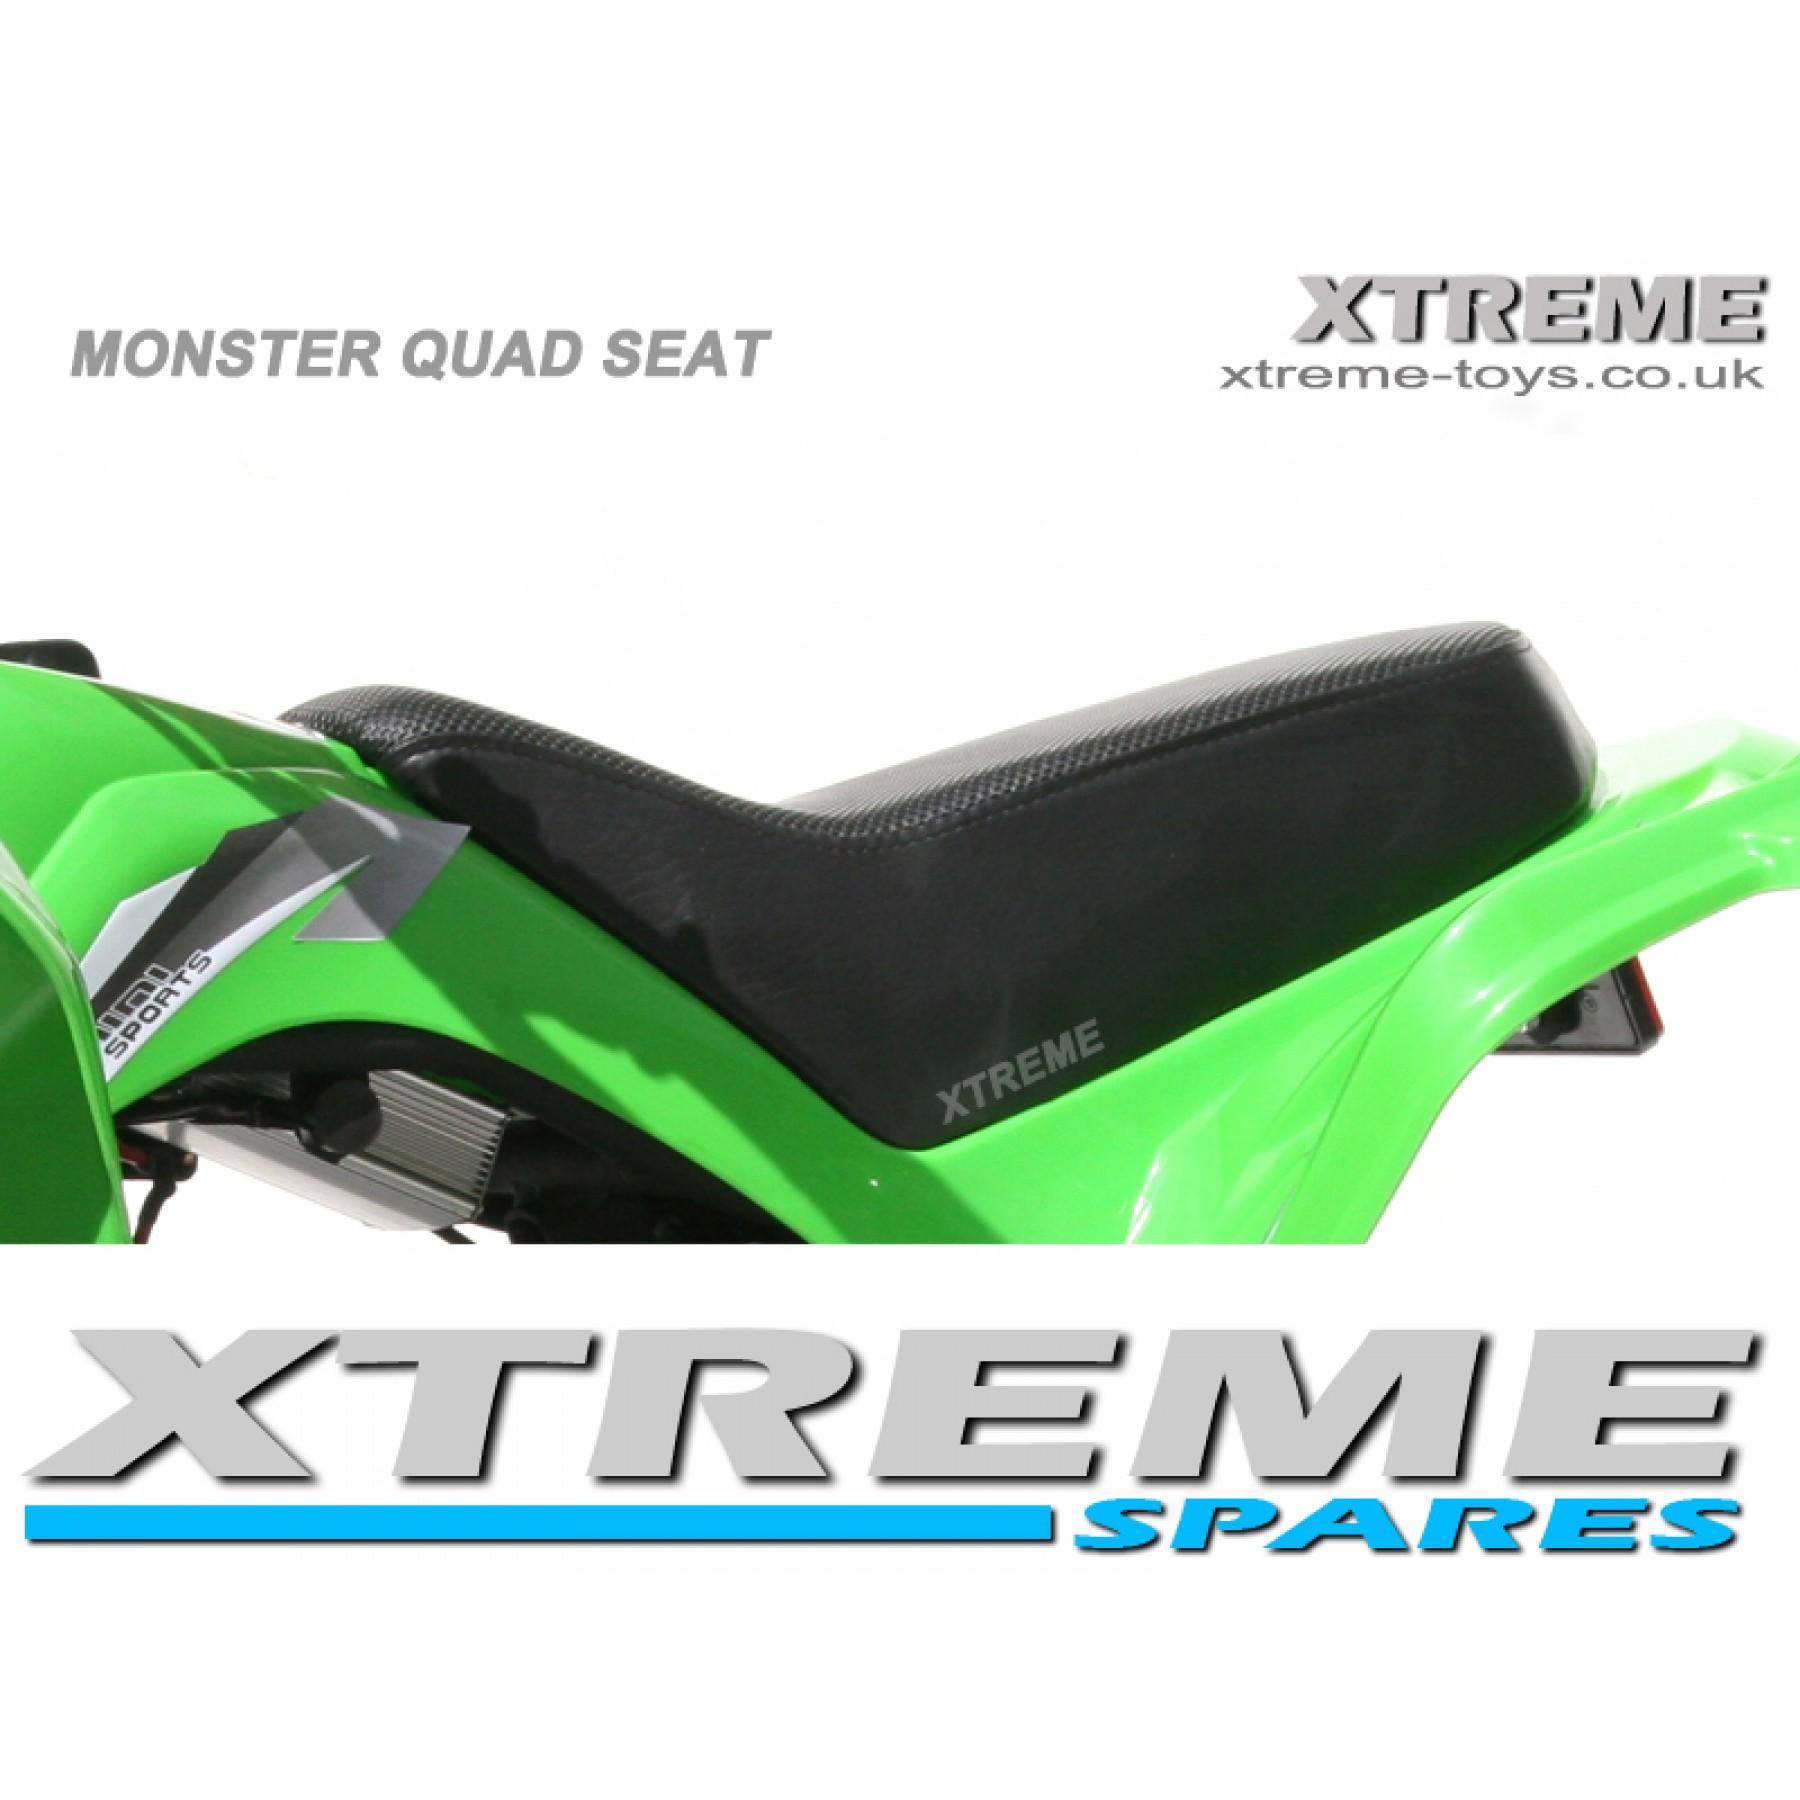 MINI MONSTER QUAD BIKE REPLACEMENT SEAT